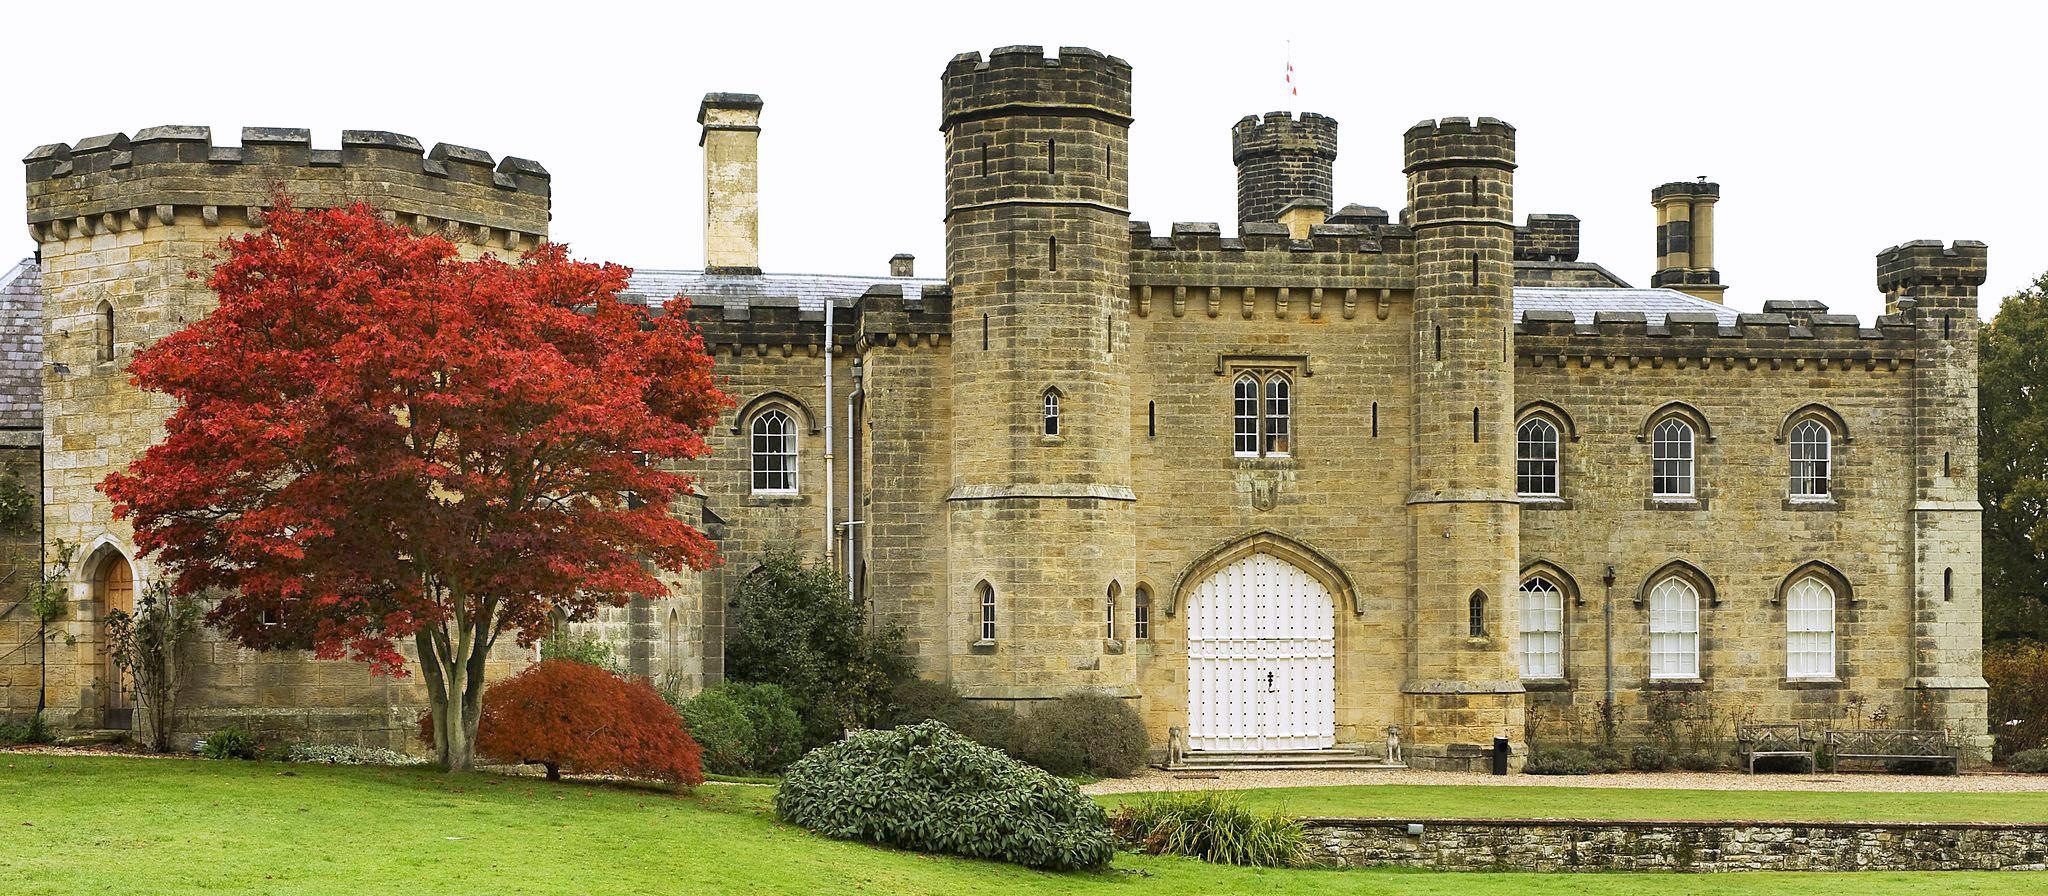 Chiddingstone Castle by Chiddingstone Castle.jpg